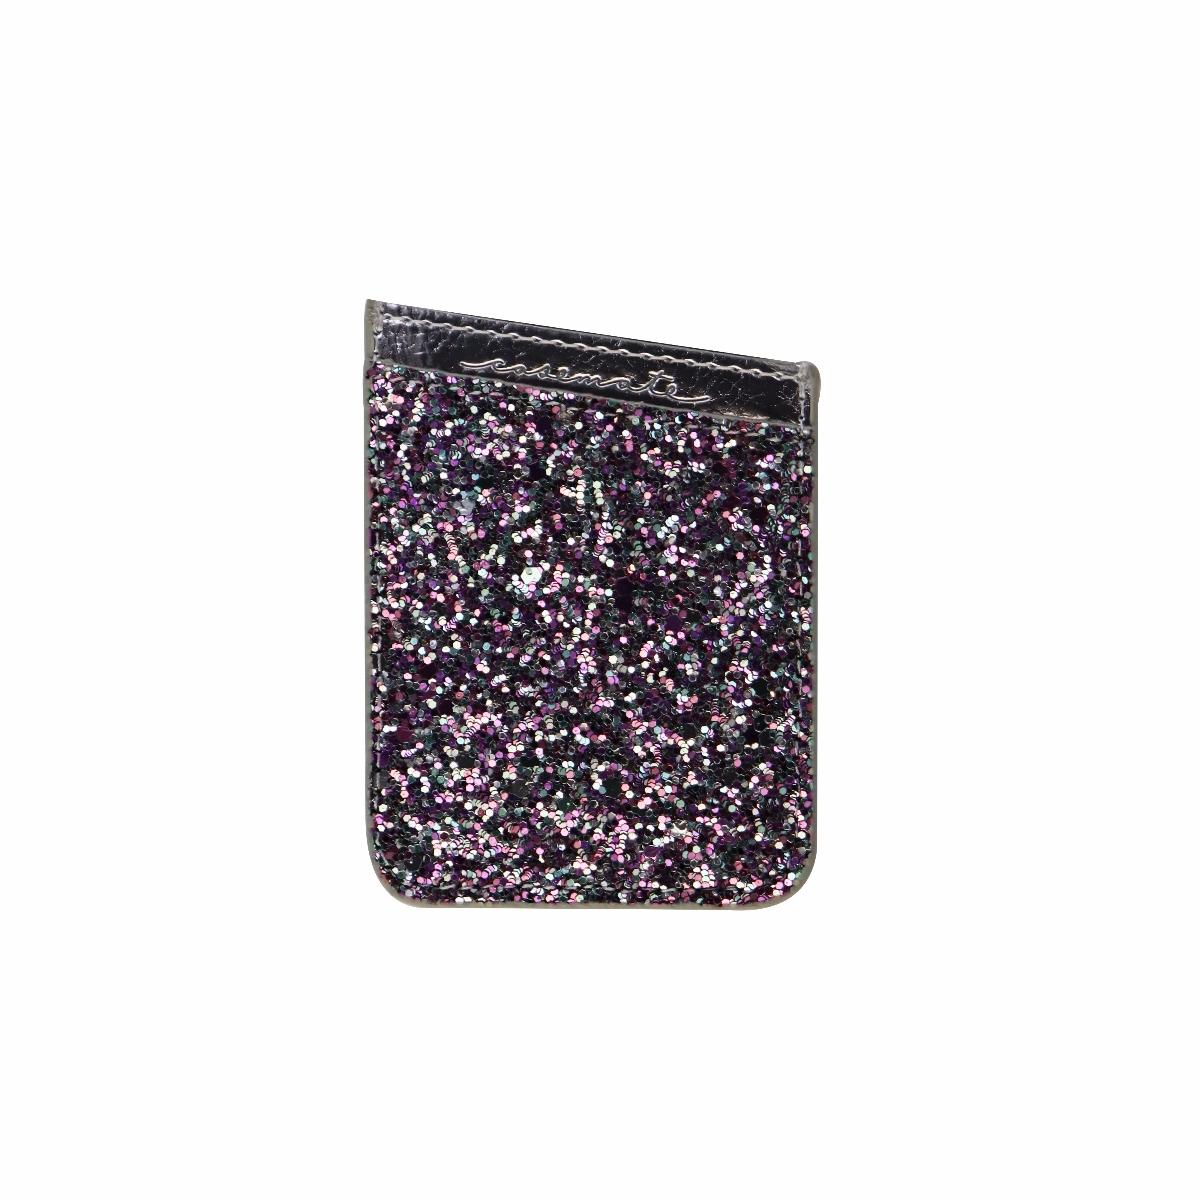 Case-Mate Pockets Series Stick On Card Holder for Smartphones - Silver Glitter